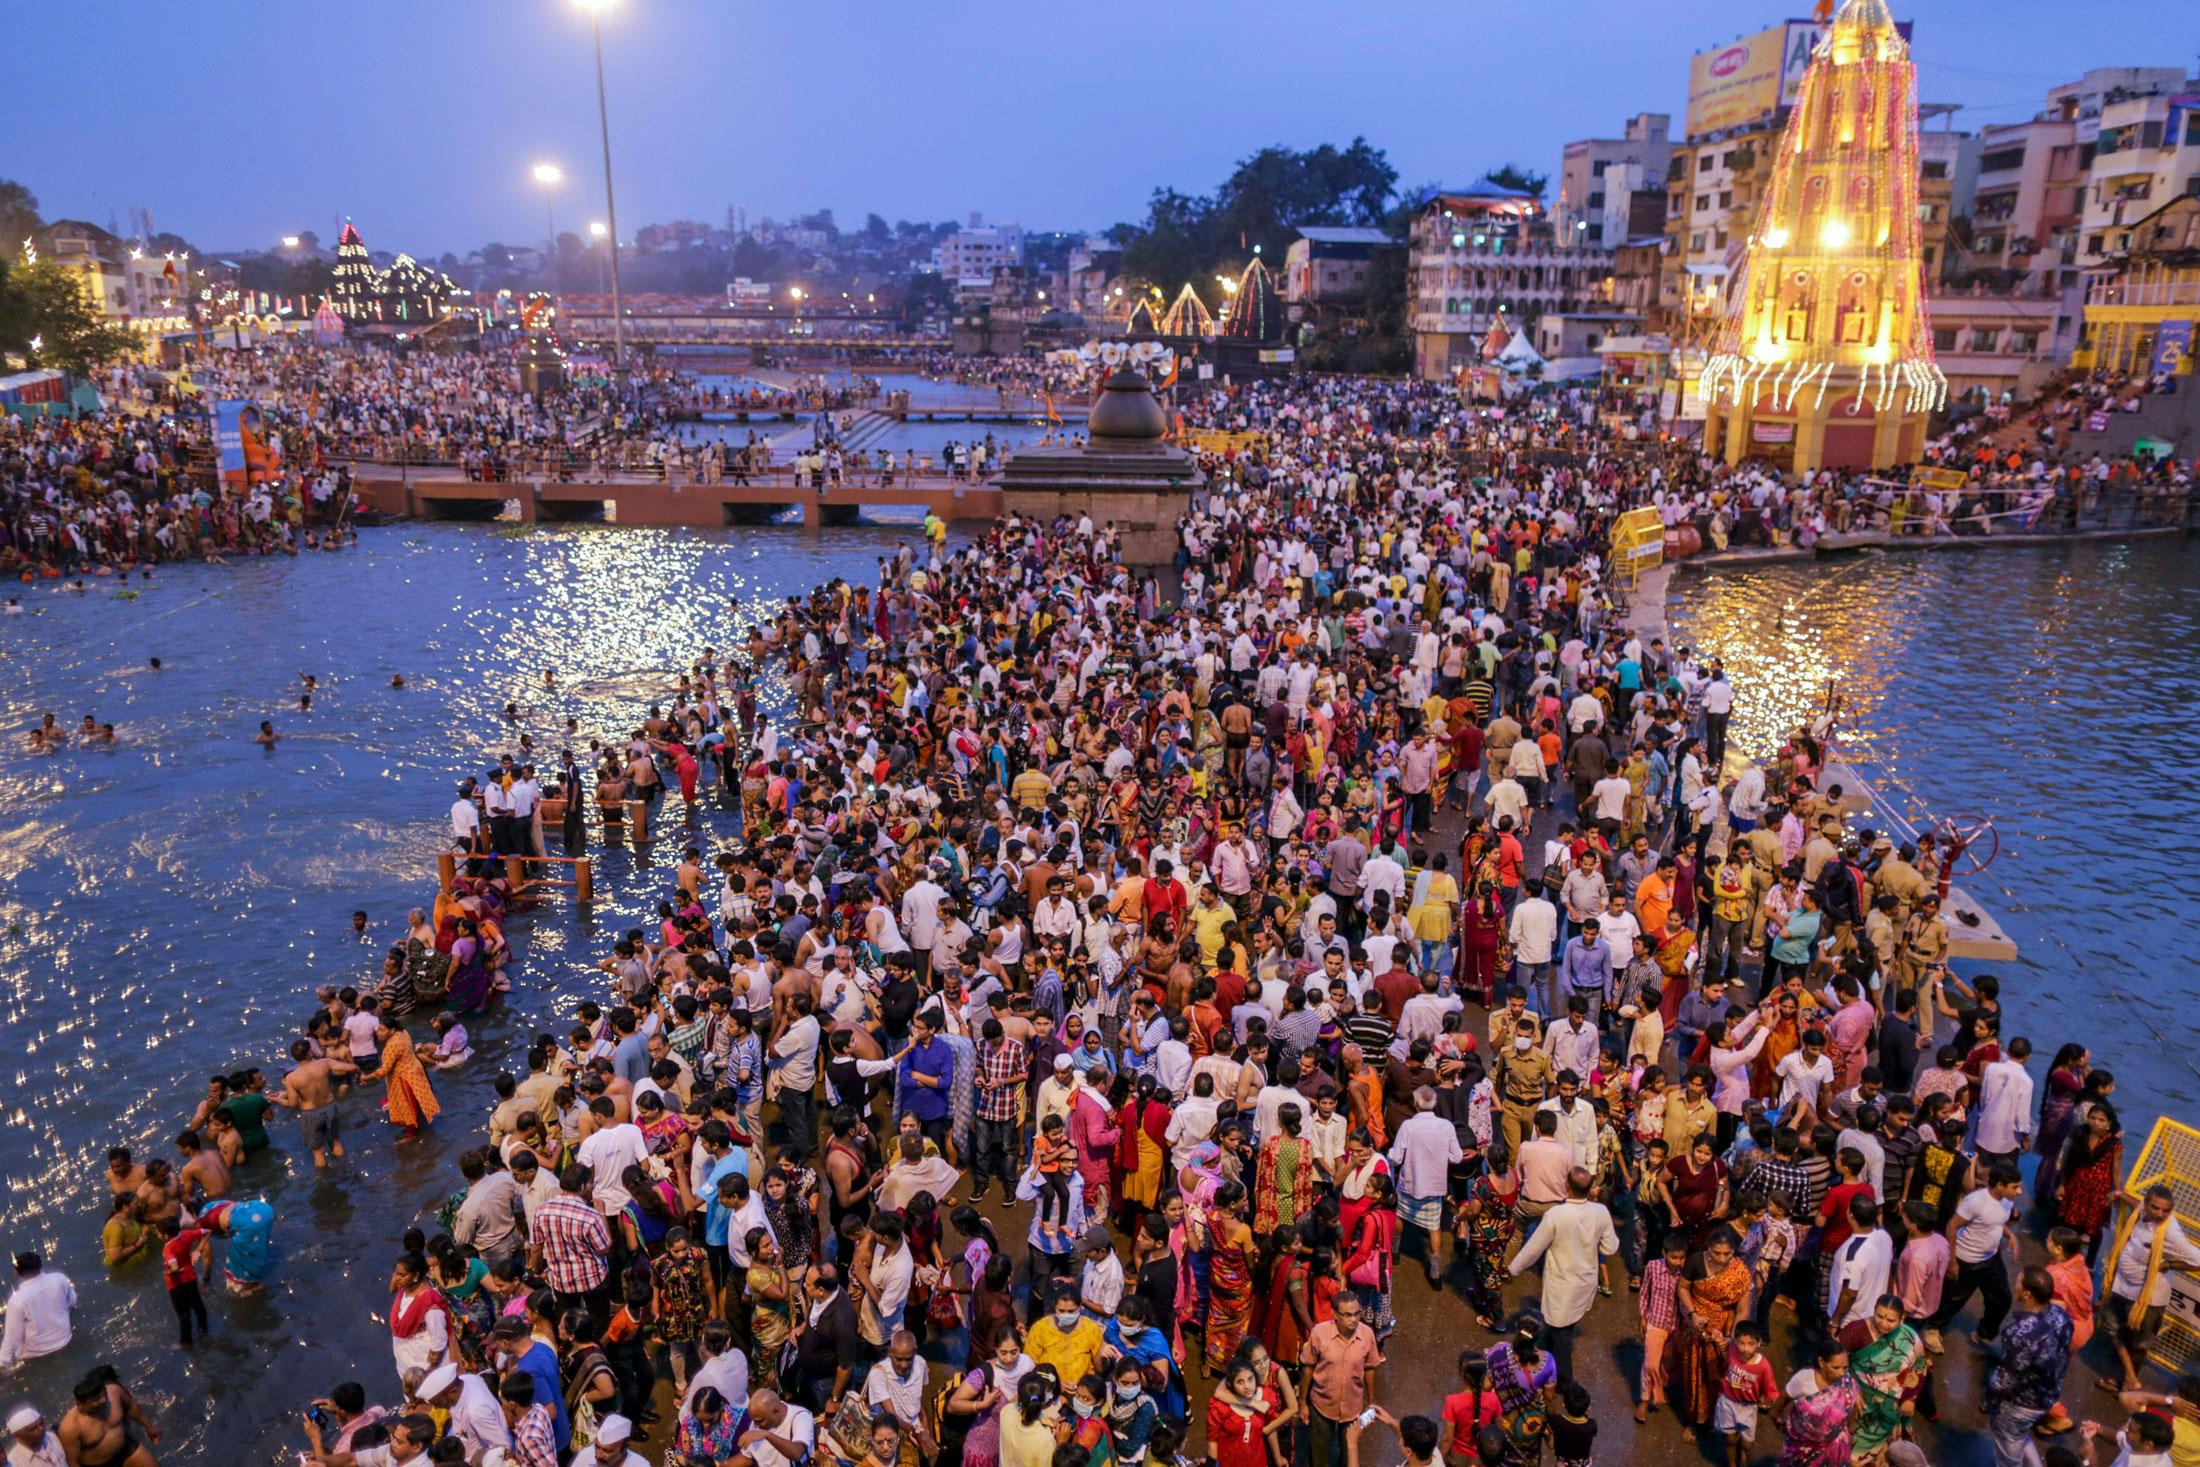 essay on kumbh mela as millions gather for kumbh mela doctors are watching